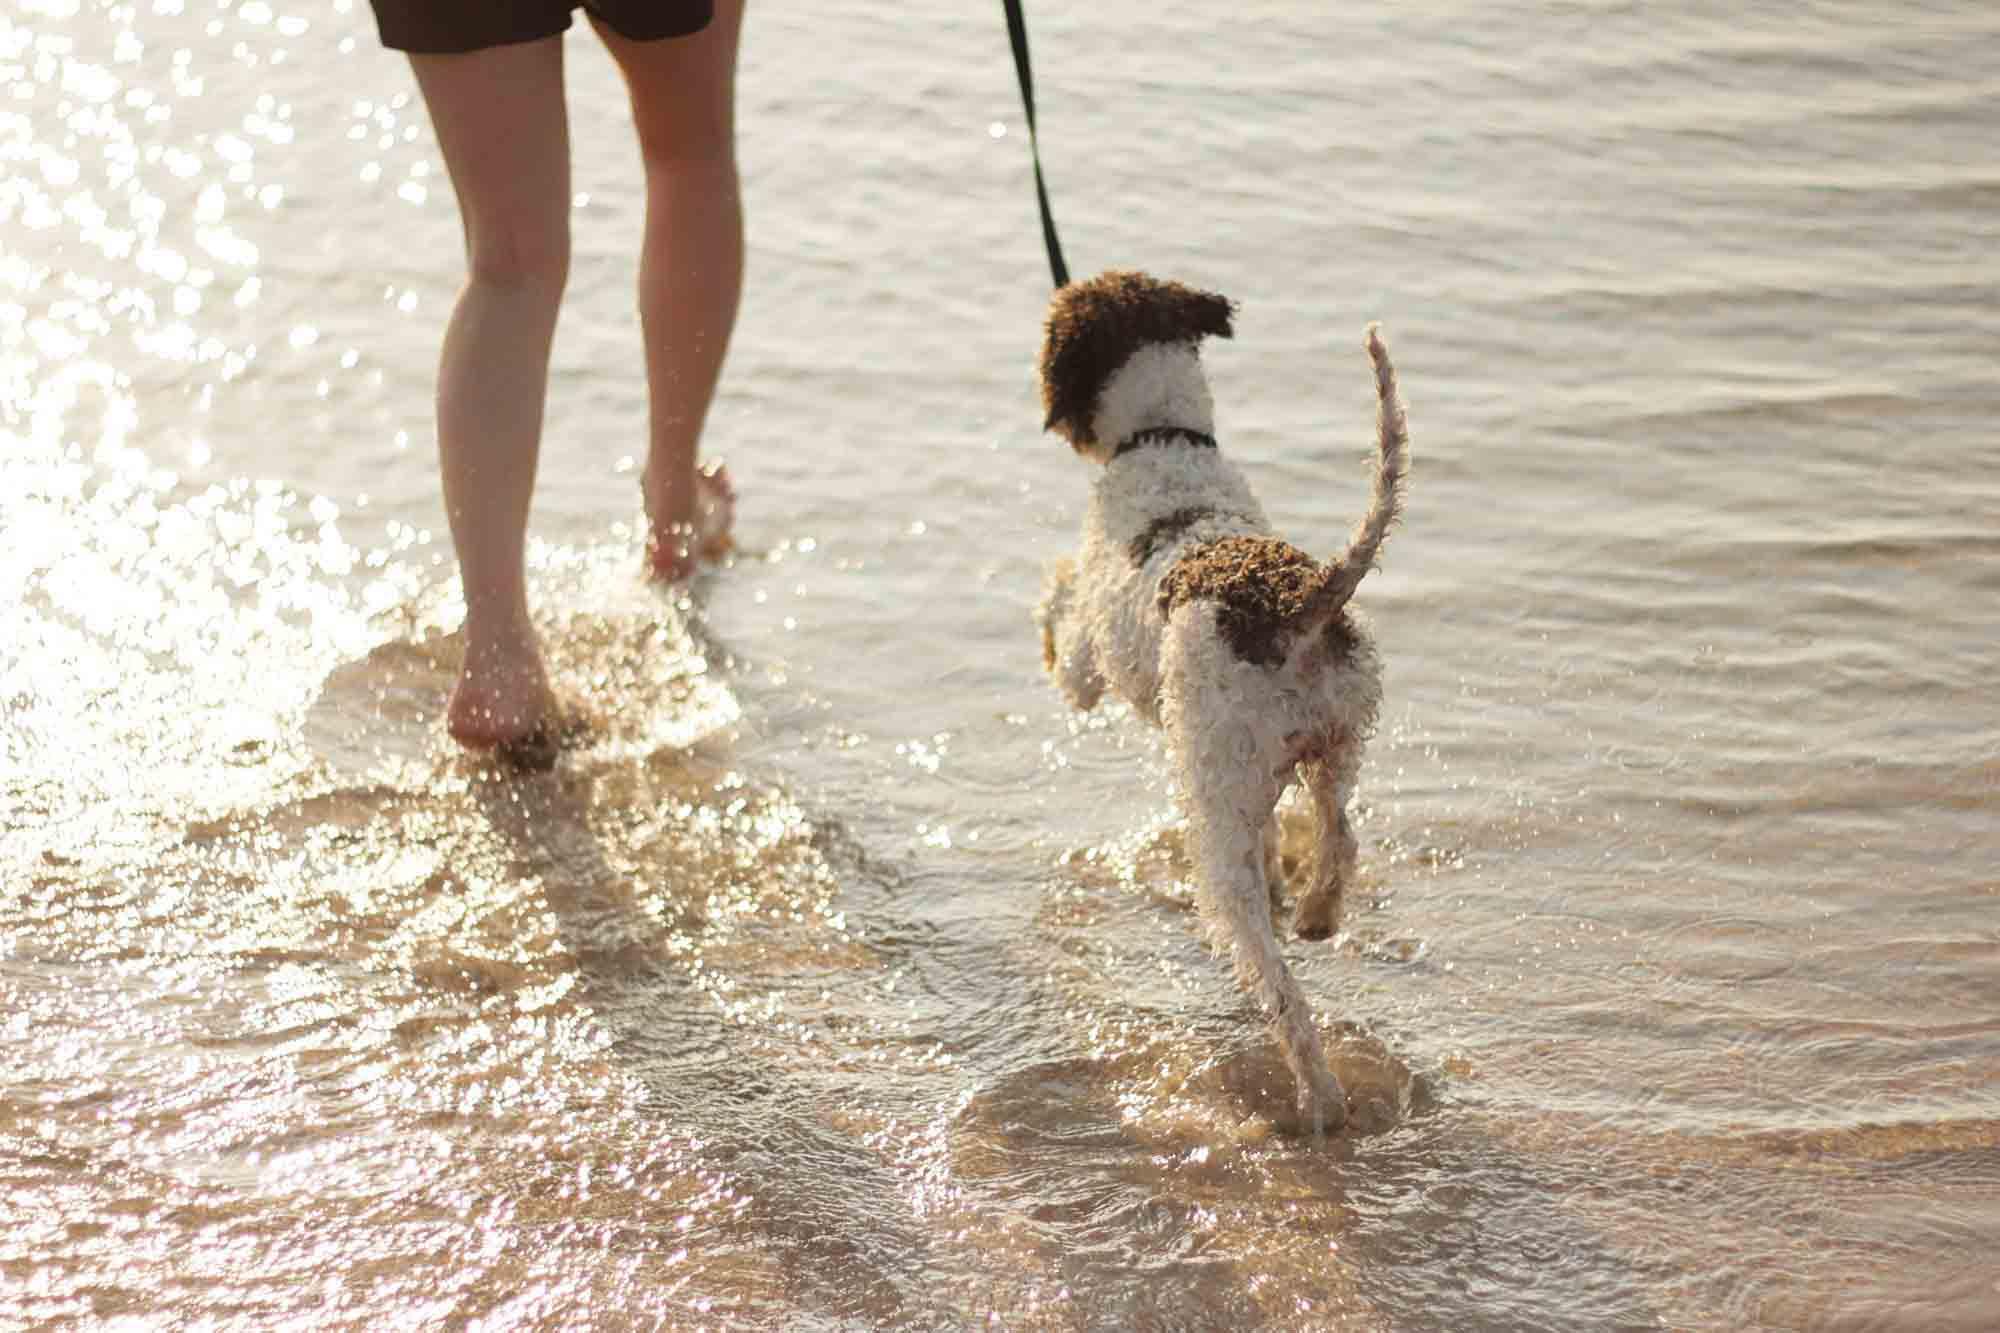 Walking dog on beach